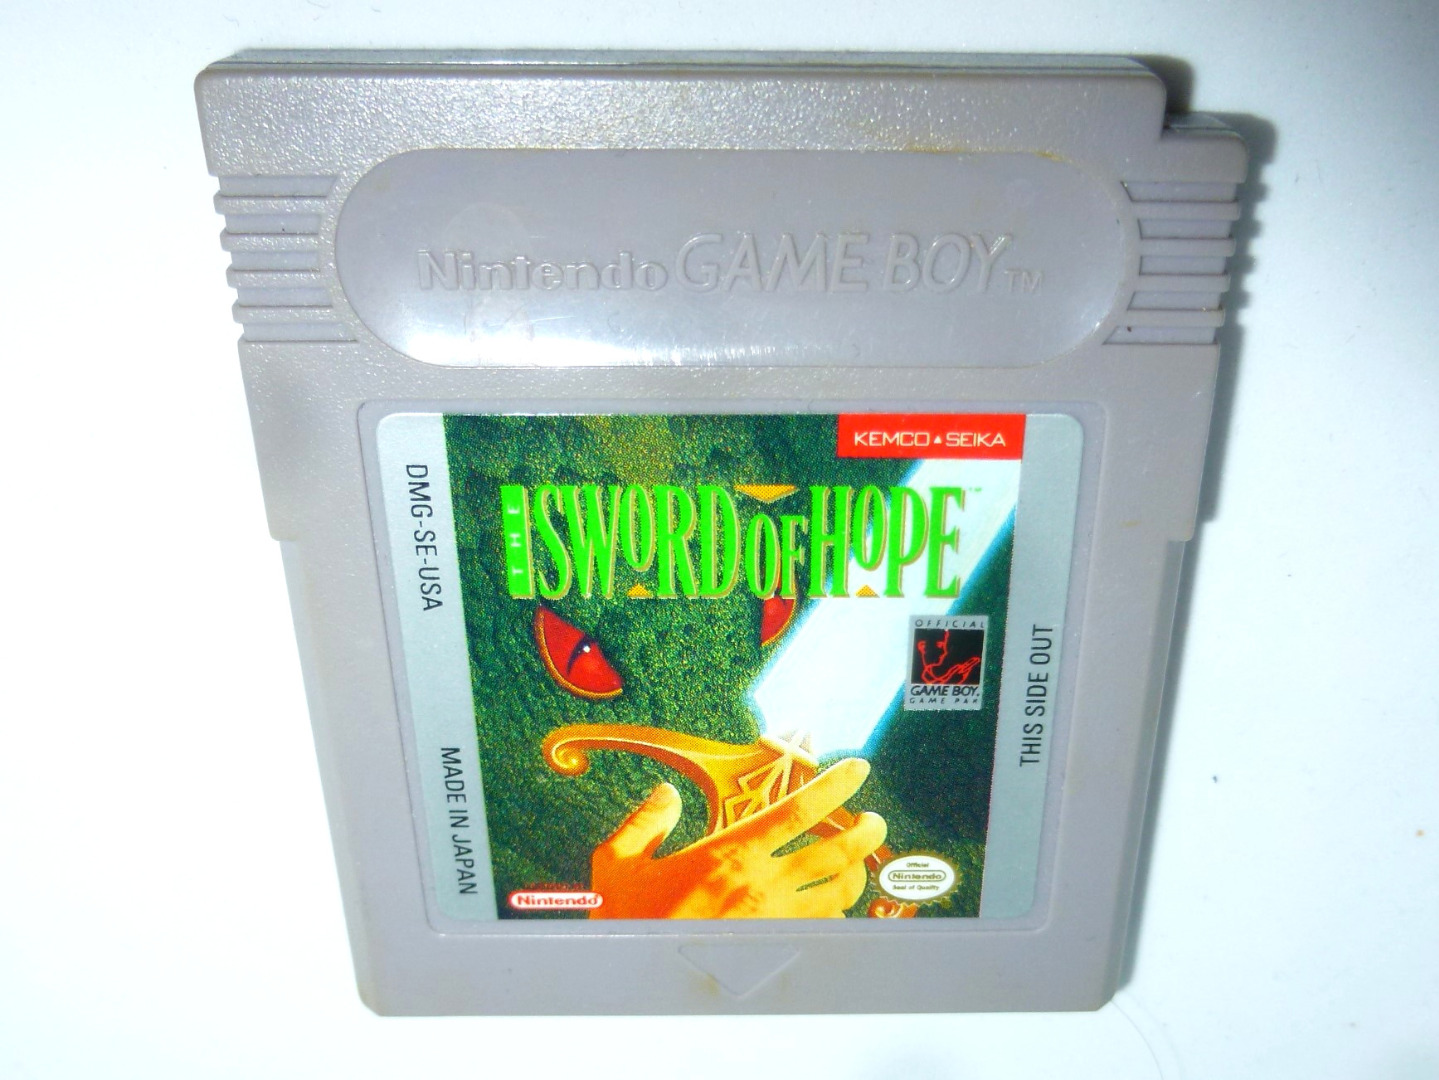 Nintendo Game Boy The Sword of